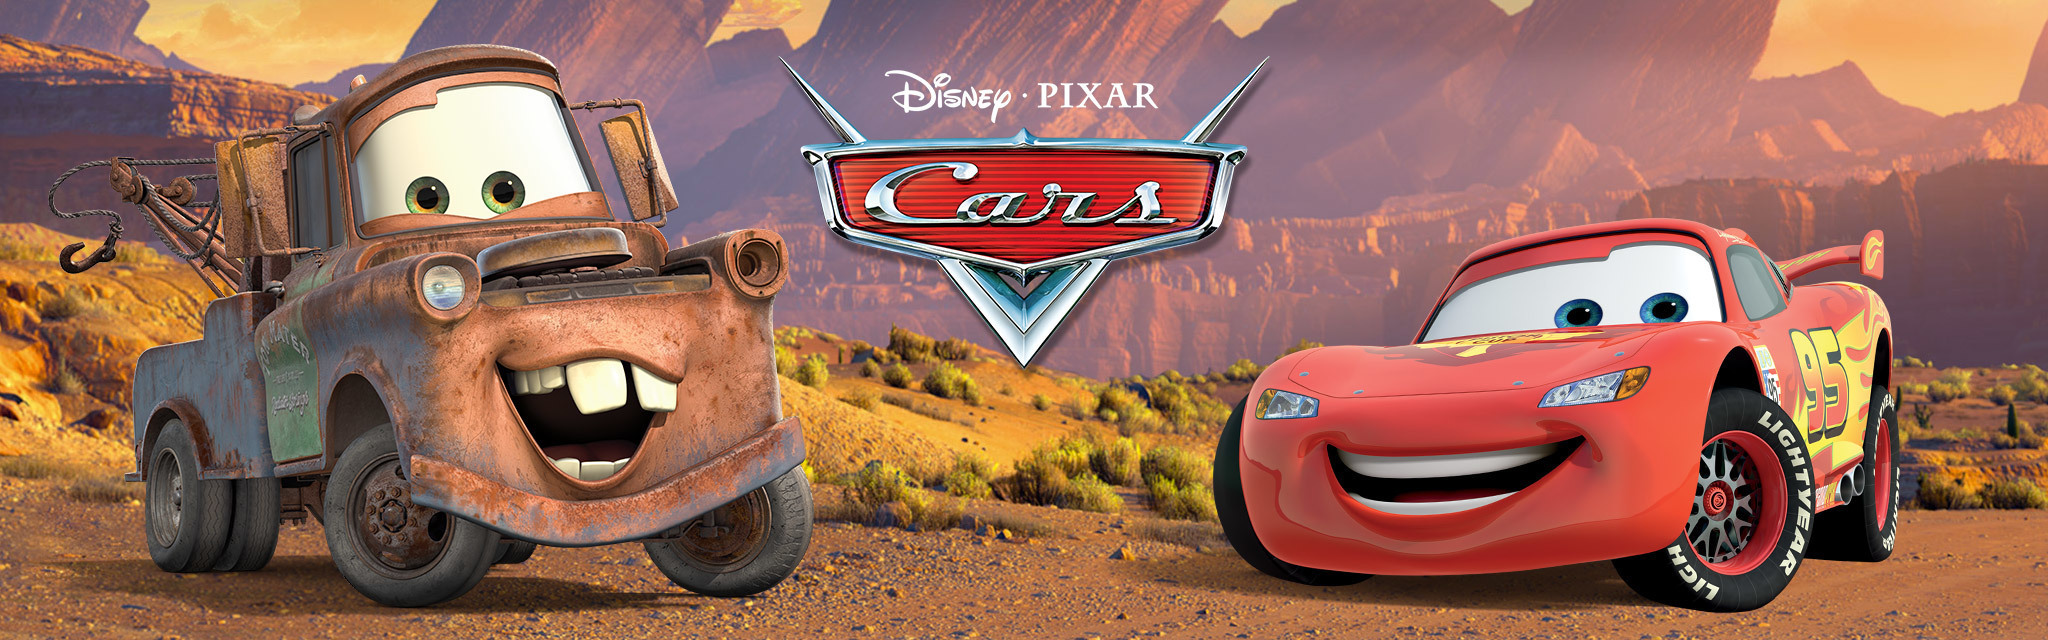 Cars - Portal